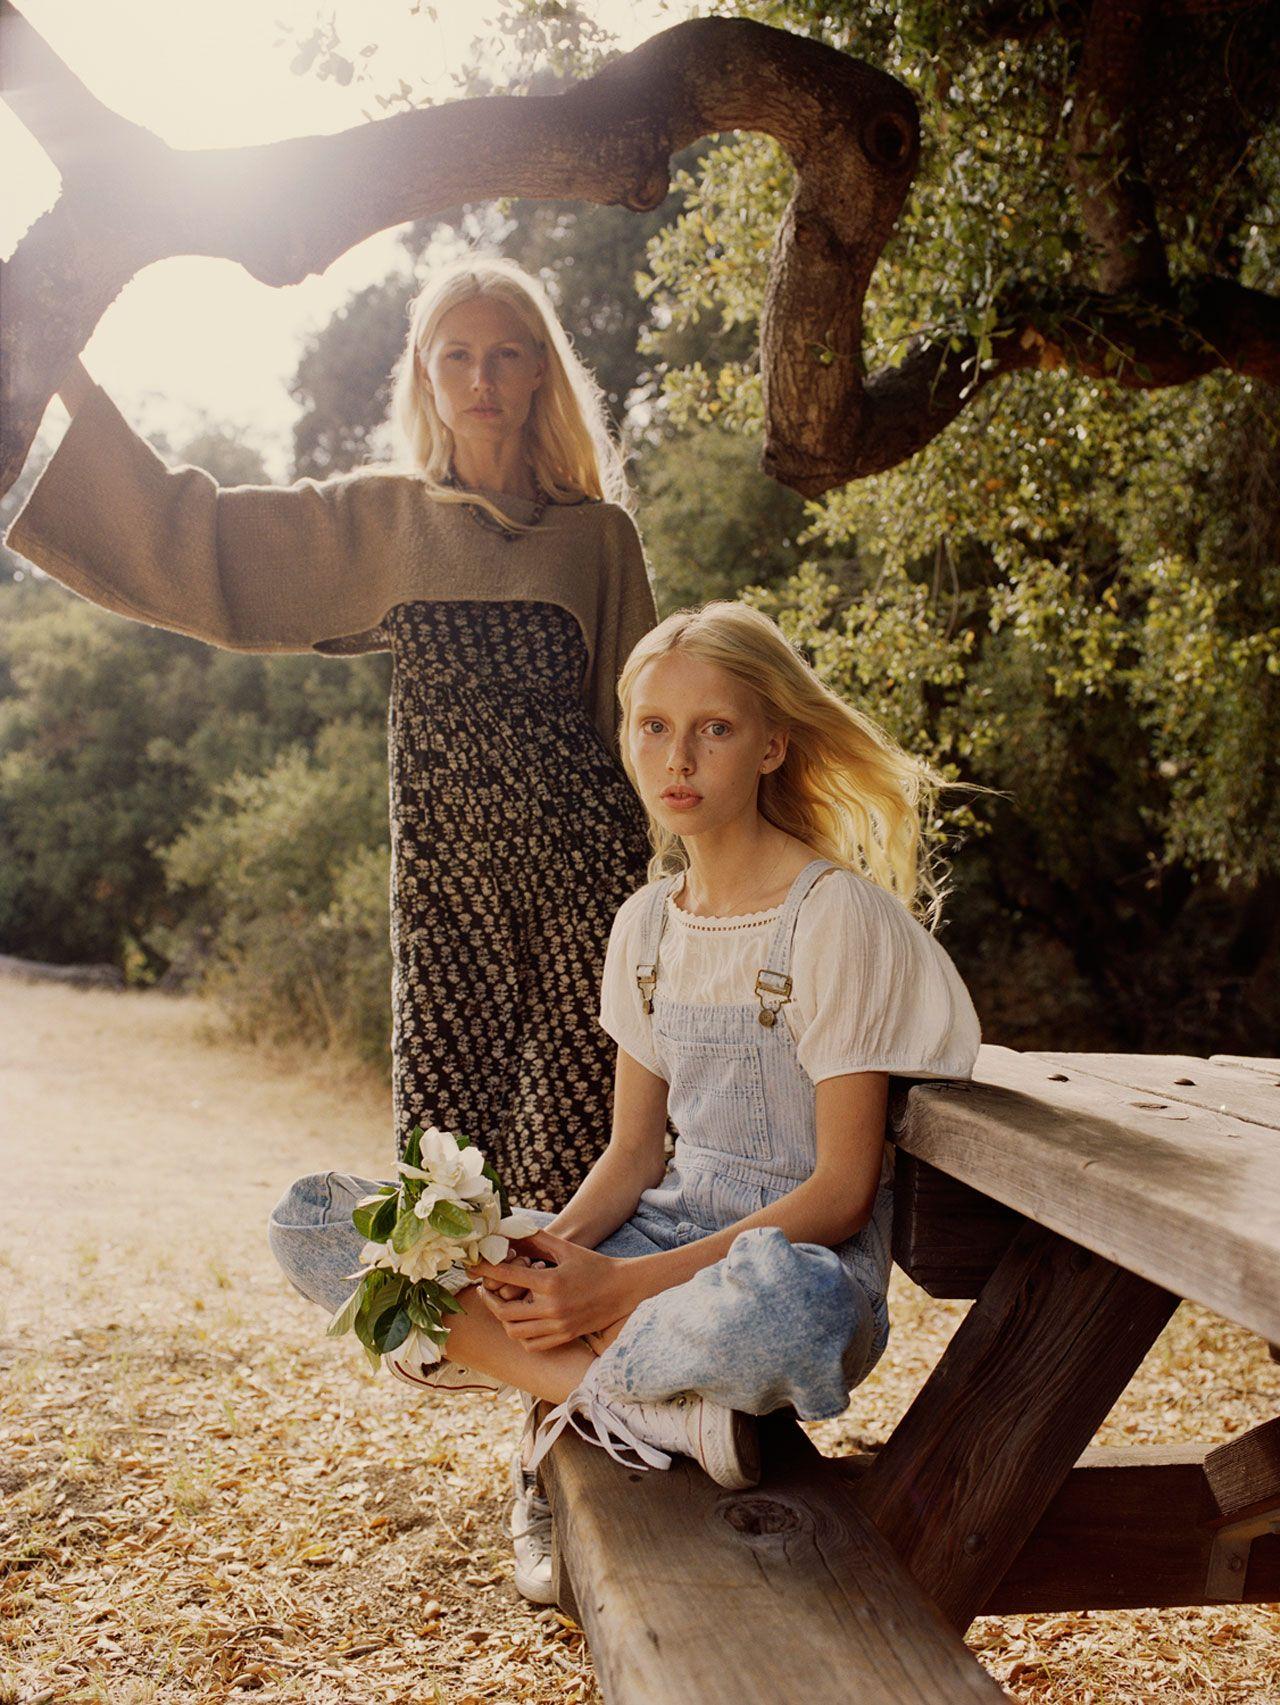 Peter Firth (born 1953),Susan Goforth Sex pictures Nori Dalisay (b. 1938),Debra Berger